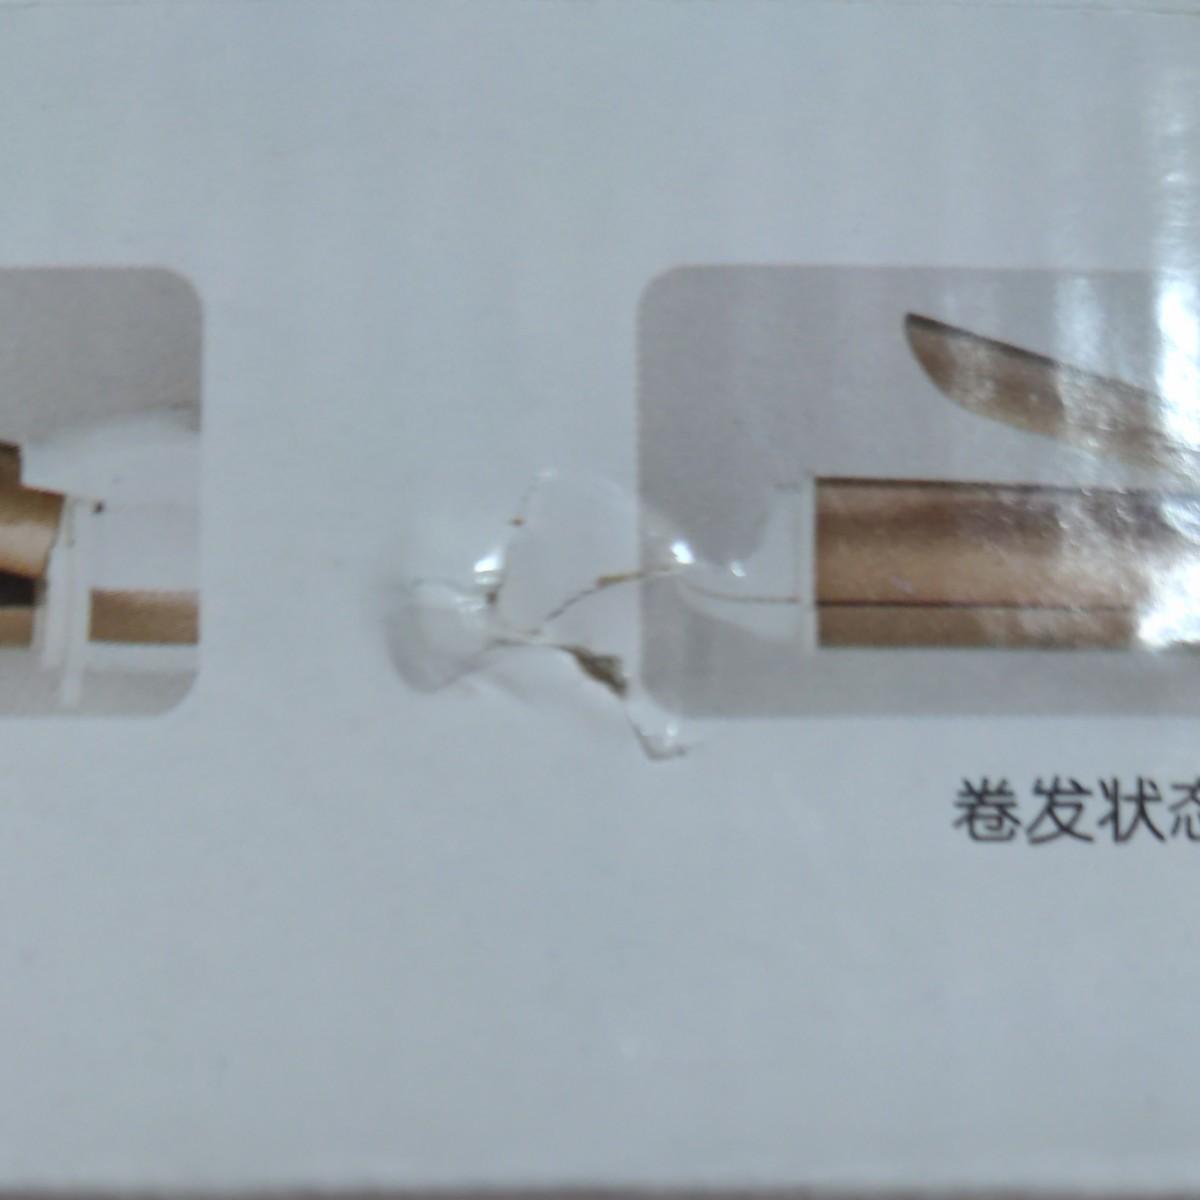 HAIDI 2wayヘアアイロン  ストレート・カール対応  携帯便利 30mm アイロン